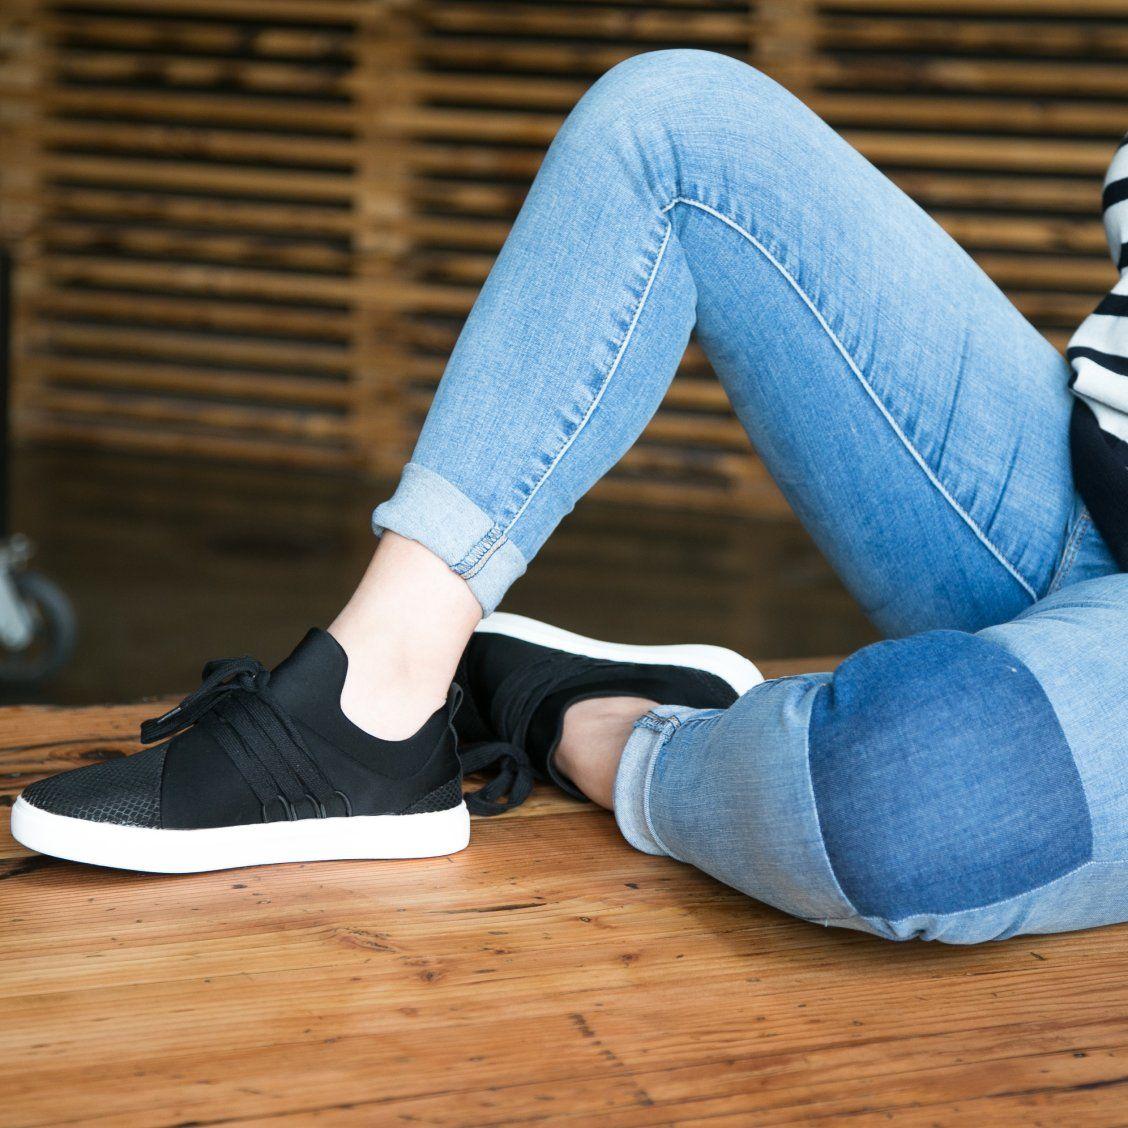 DREA LACE-UP SNEAKER | Sneakers, Lace